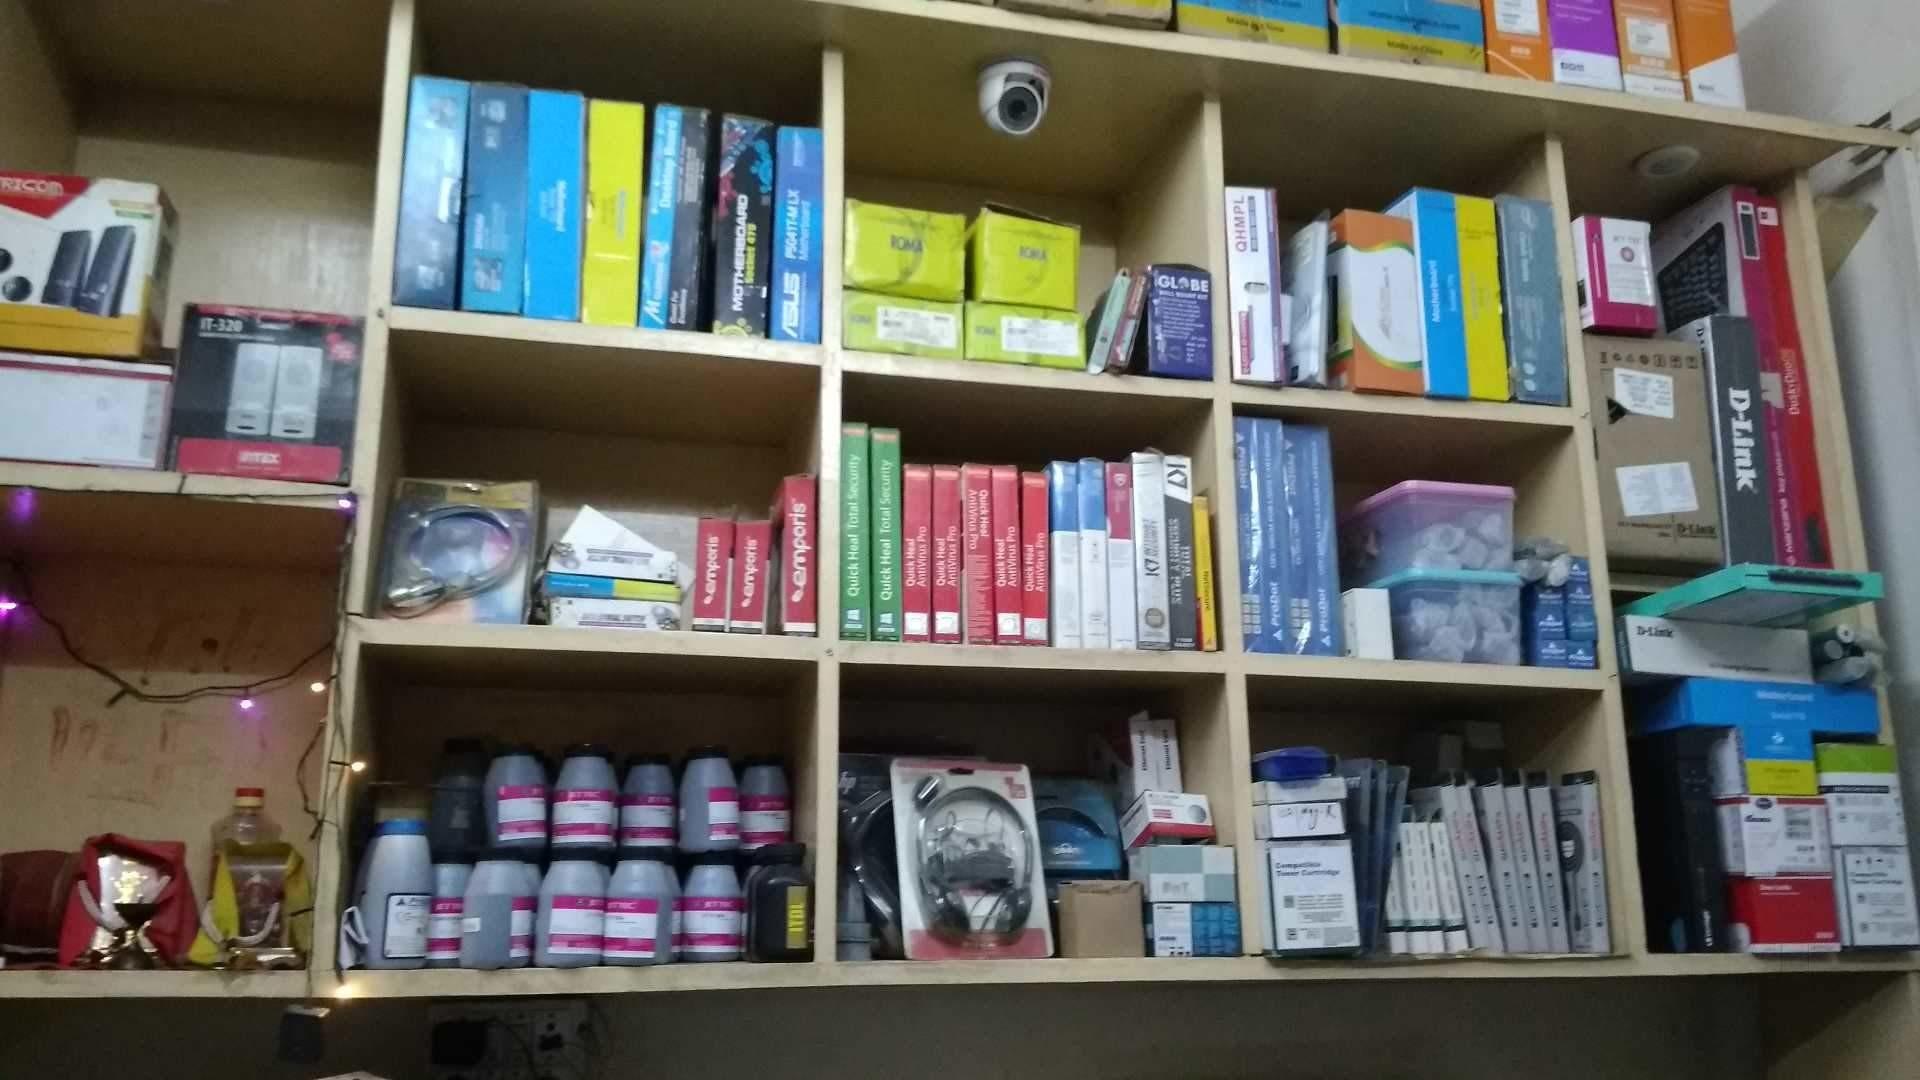 1920x1440 Universal Books & Stationeries, Kelkarbagh Belgaum - Stationery Shops in Belgaum - Justdial